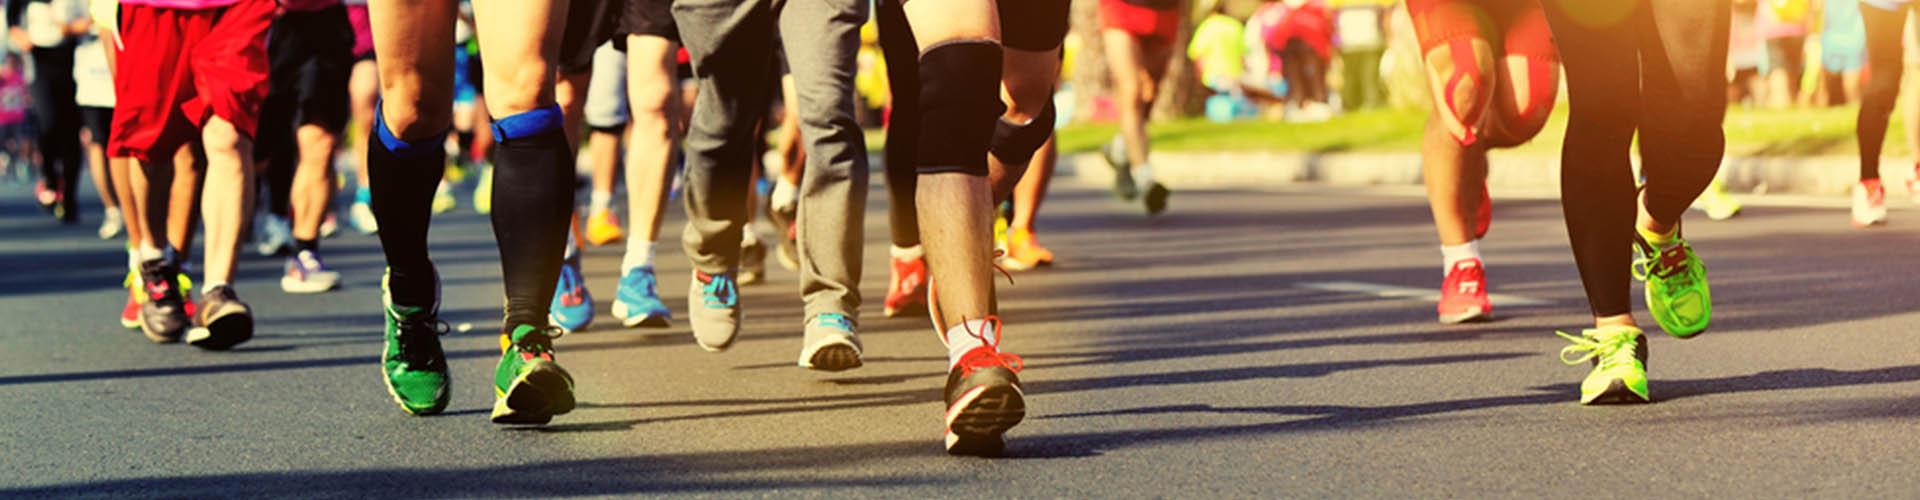 People's legs running a marathon